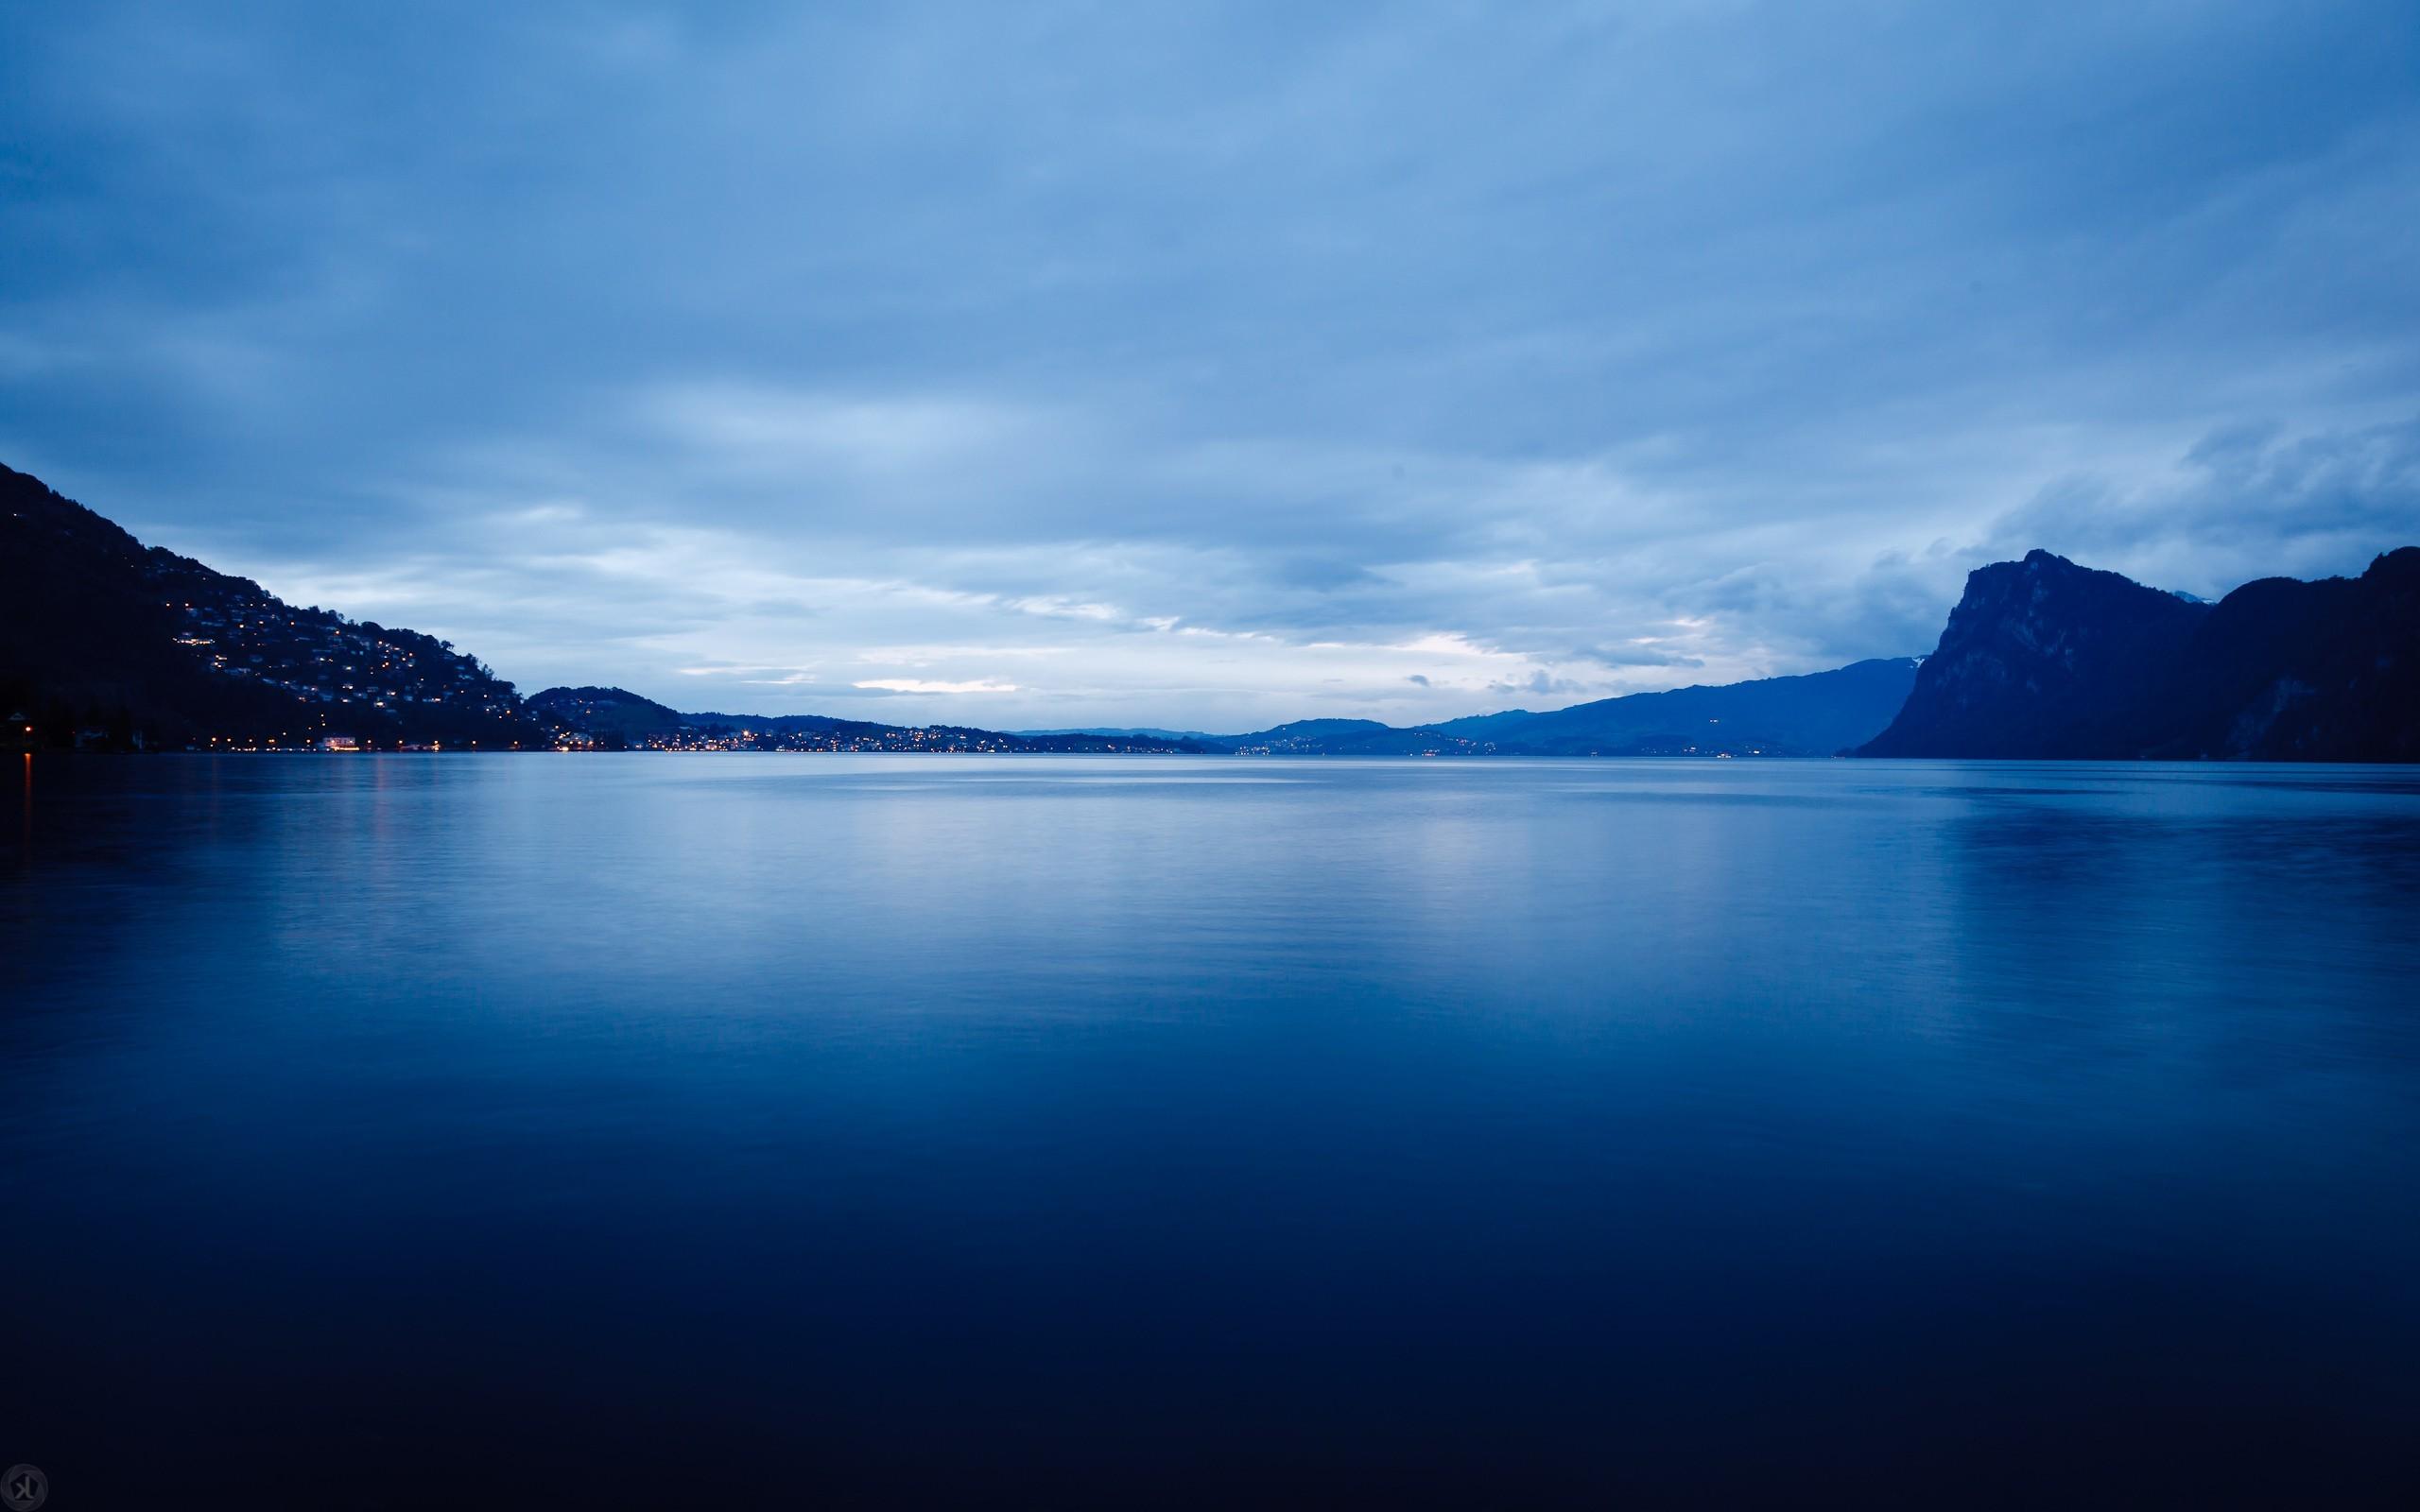 Wallpaper : sunlight, landscape, sea, bay, lake ...Lake Water Wallpaper